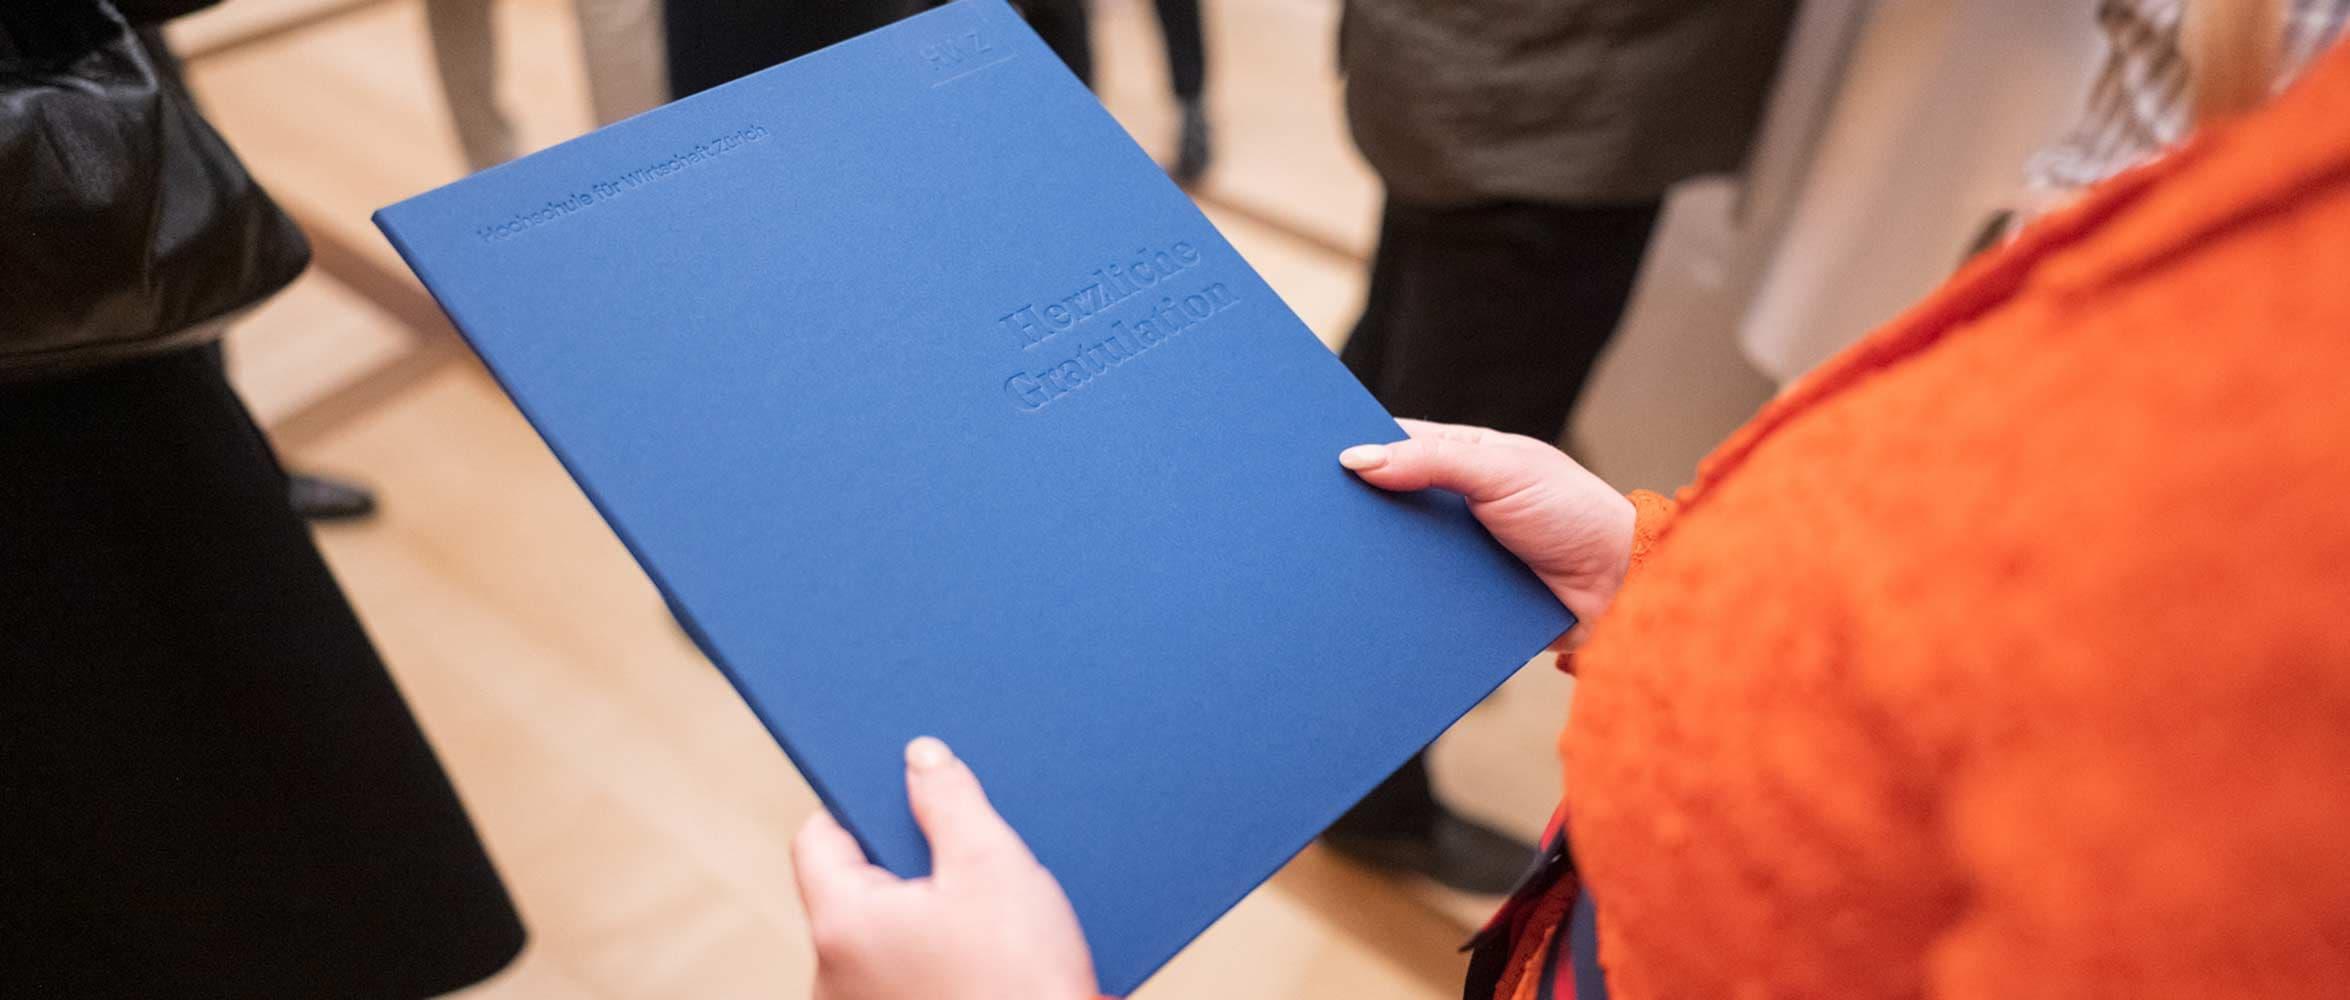 Titel Beitrag Bachelor Diplomfeiern